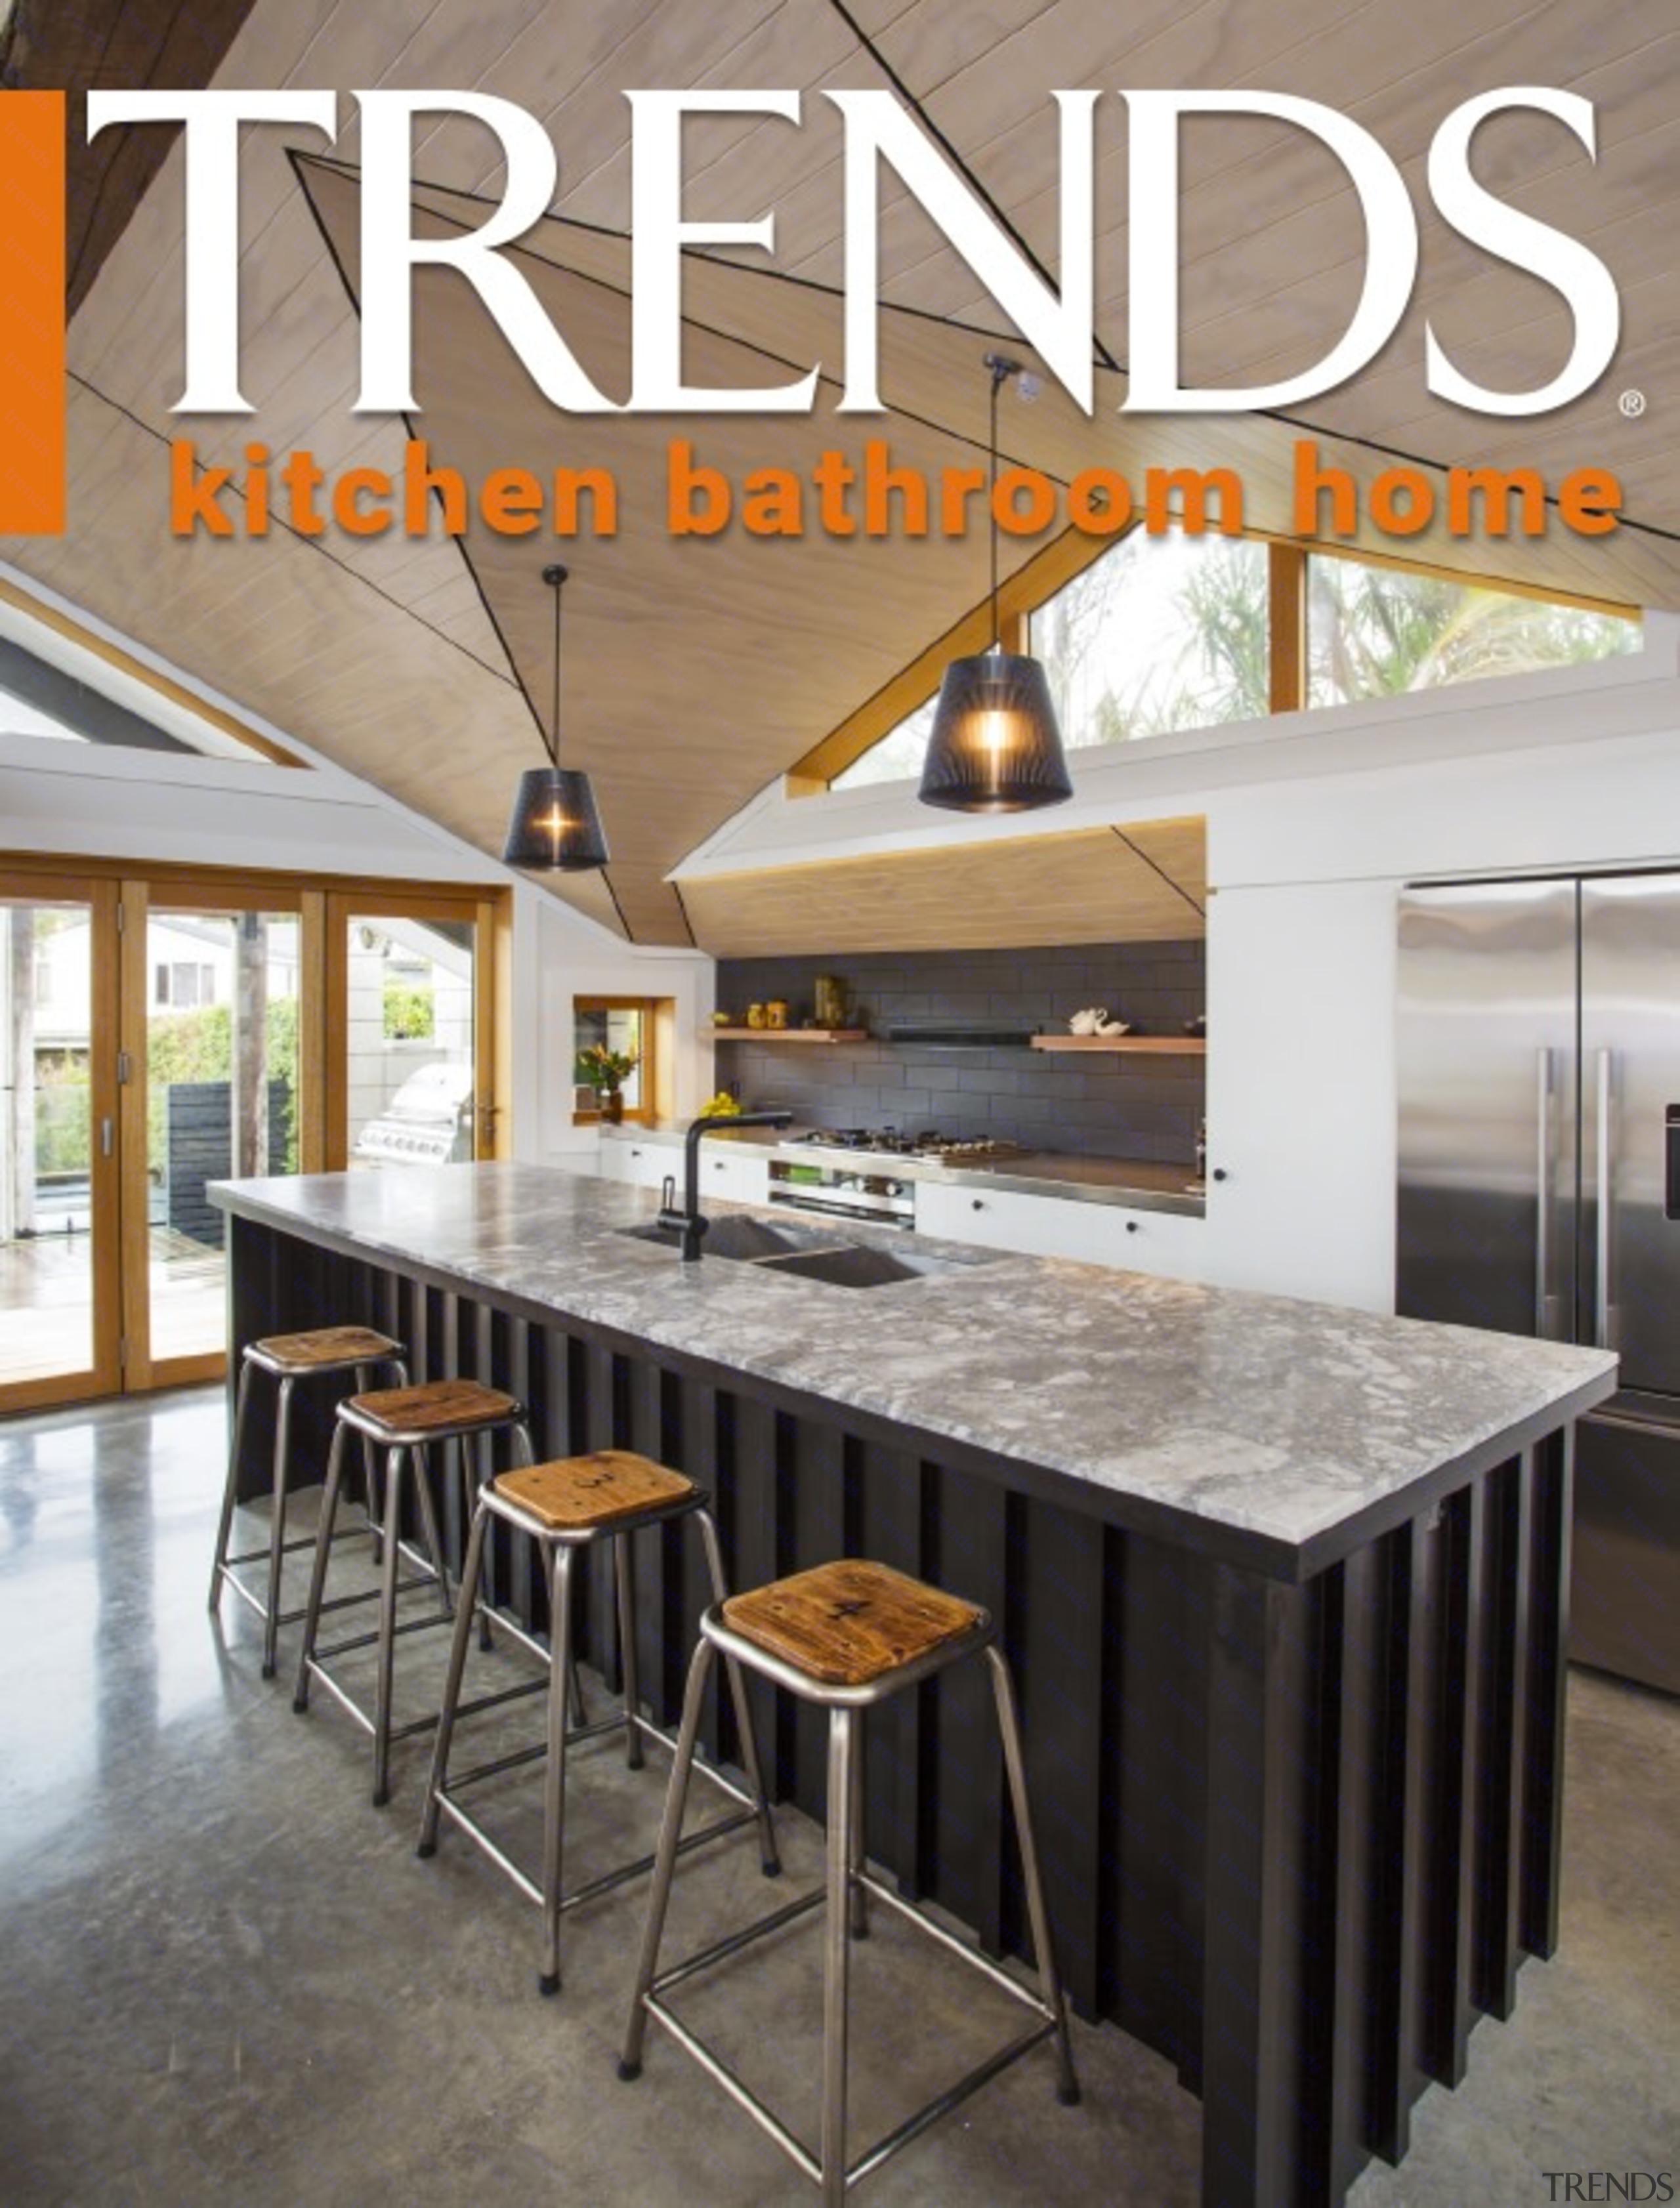 Nz3303 Minicover countertop, flooring, furniture, interior design, kitchen, real estate, table, gray, white